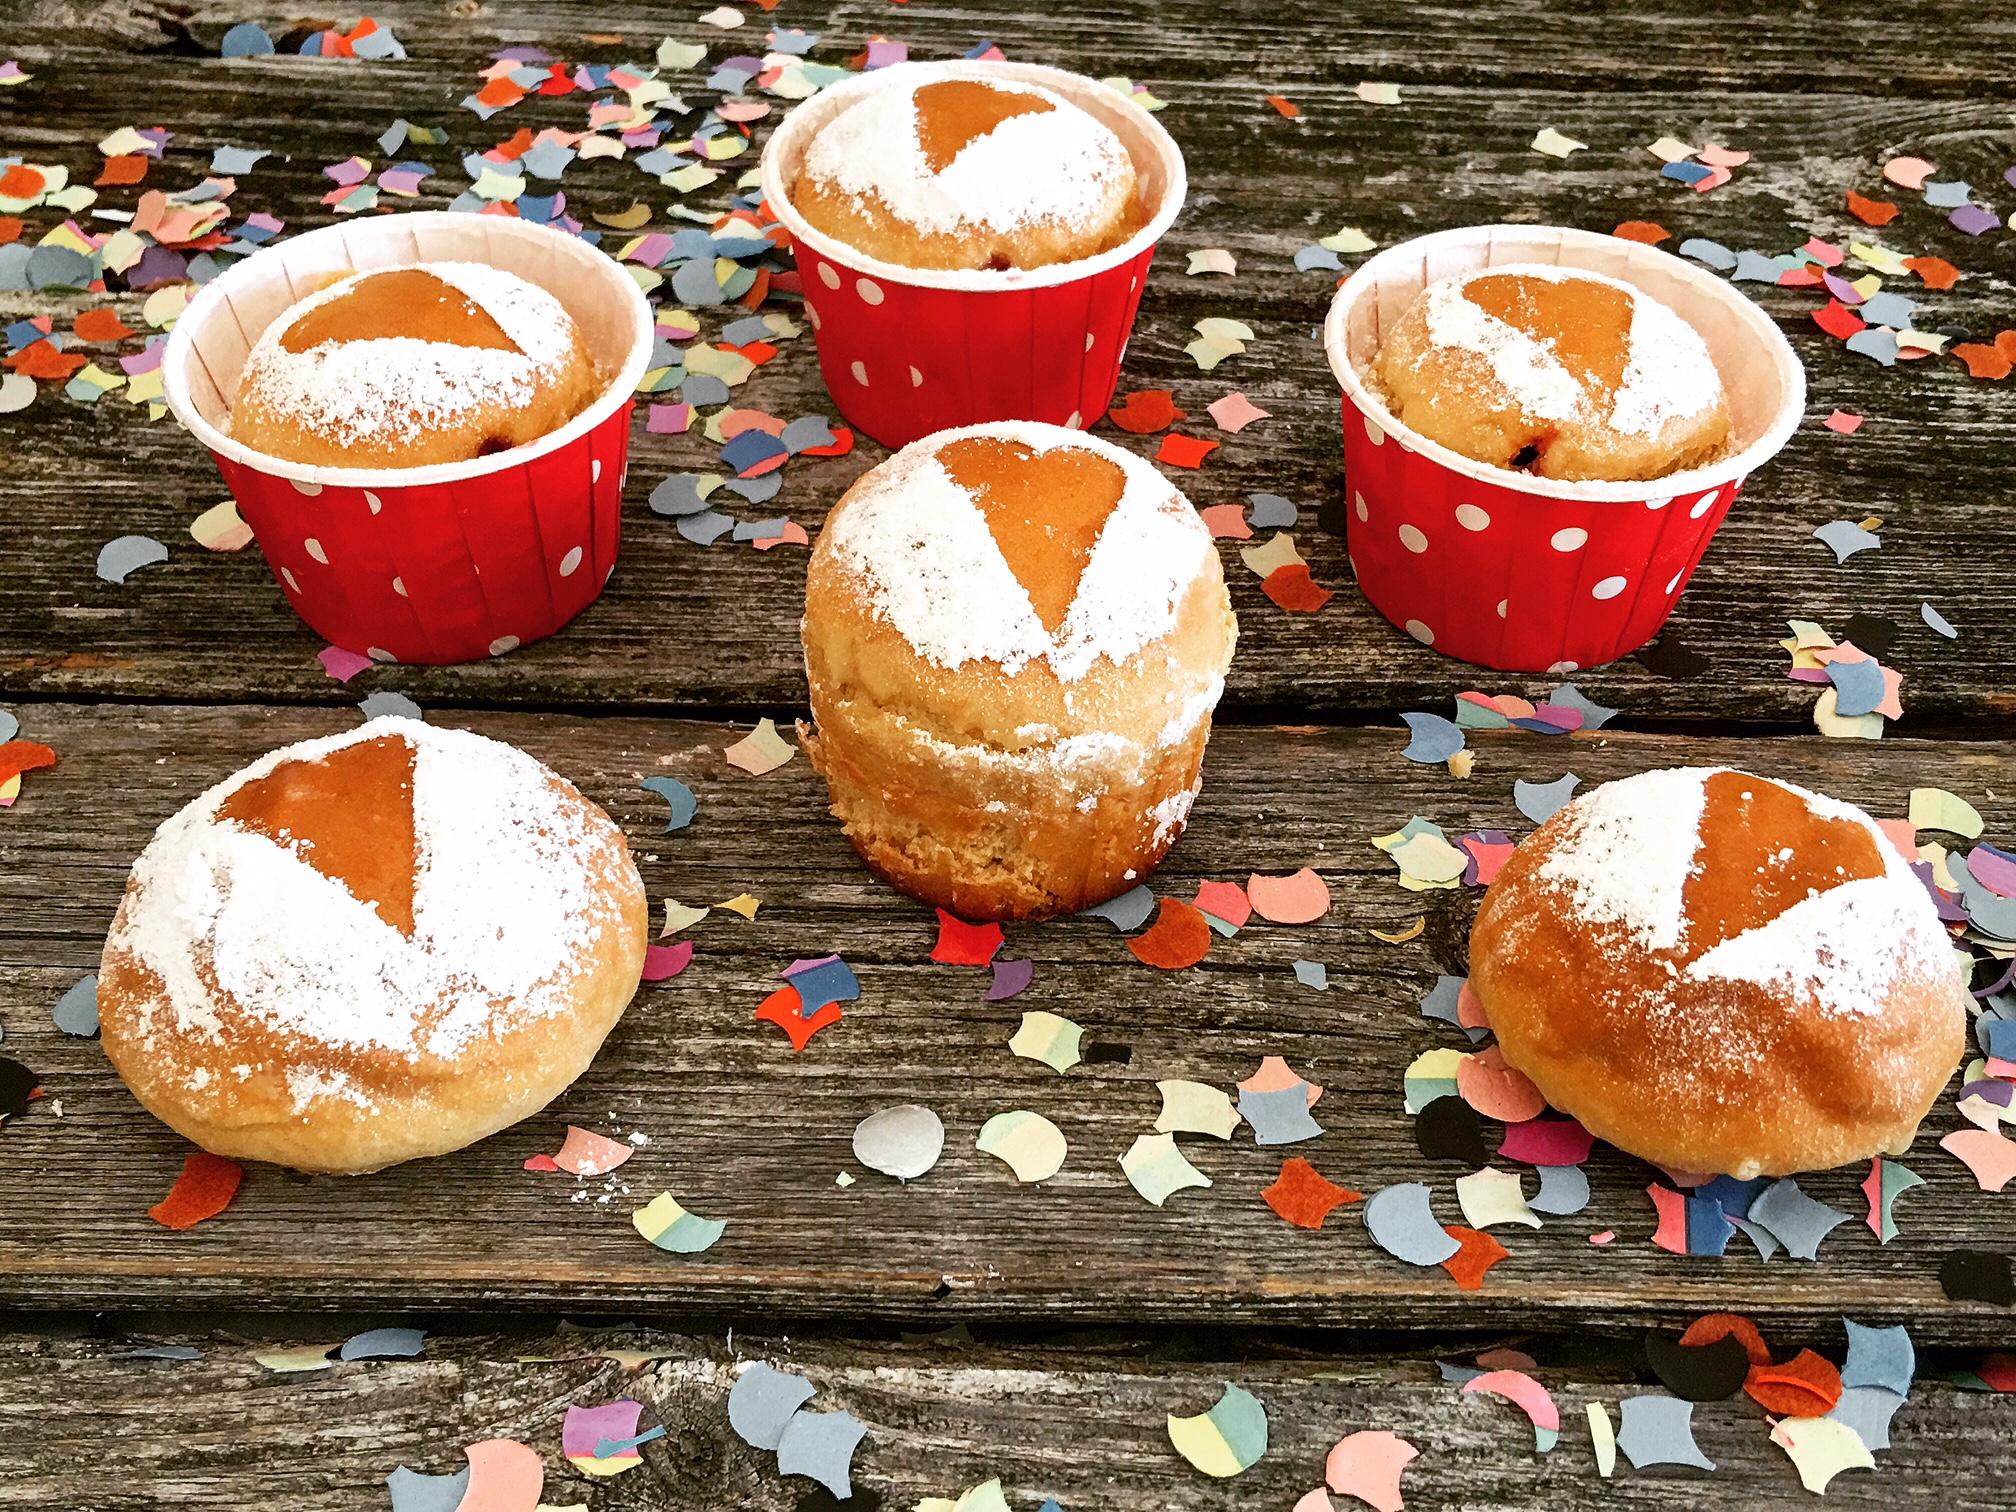 Krapfen Cupcakes Fasching.JPG